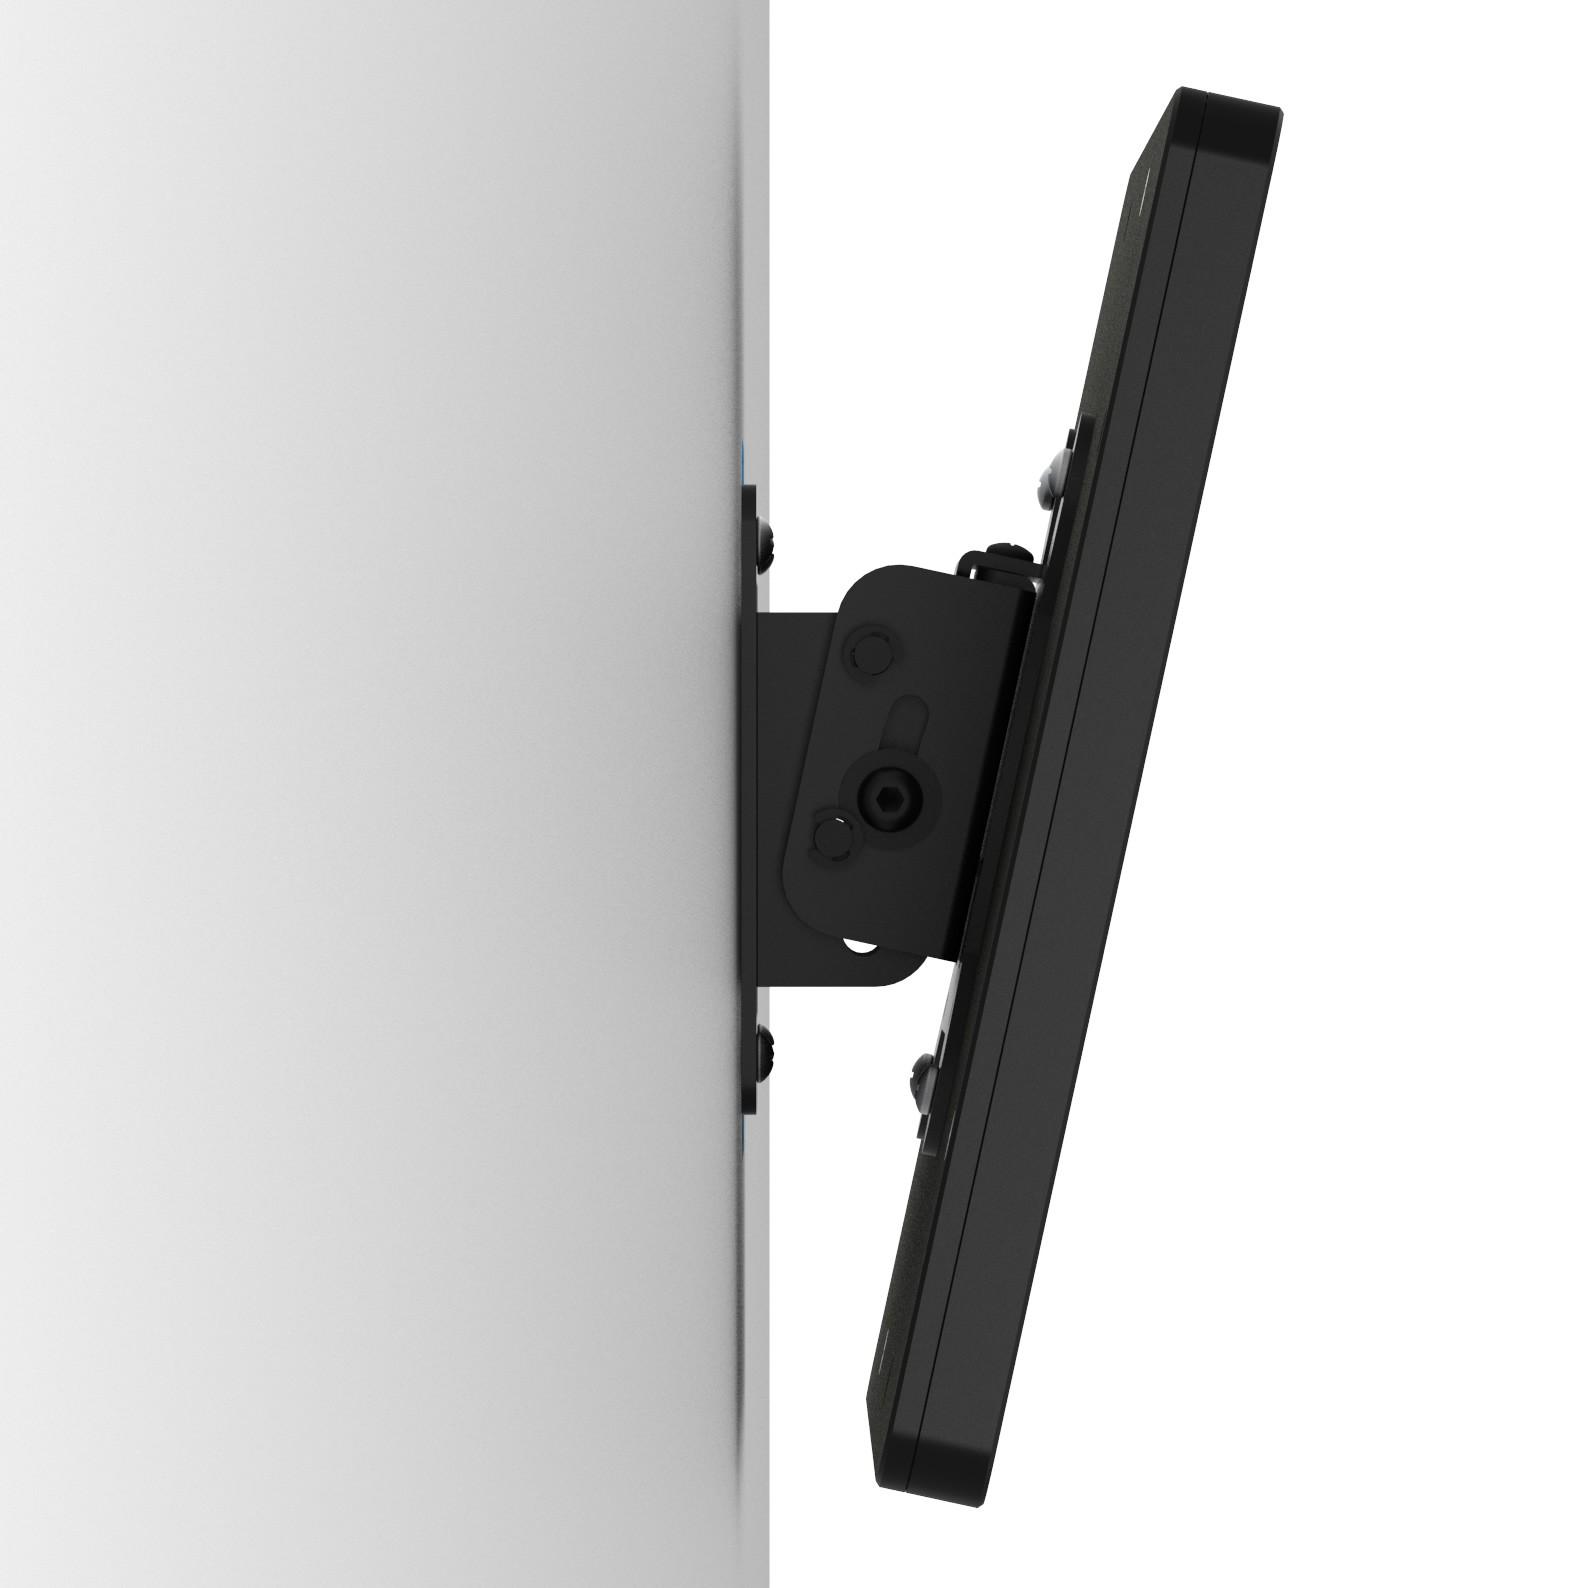 Tilting Wall Samsung Galaxy Tab A 97 Tablet Mount Black